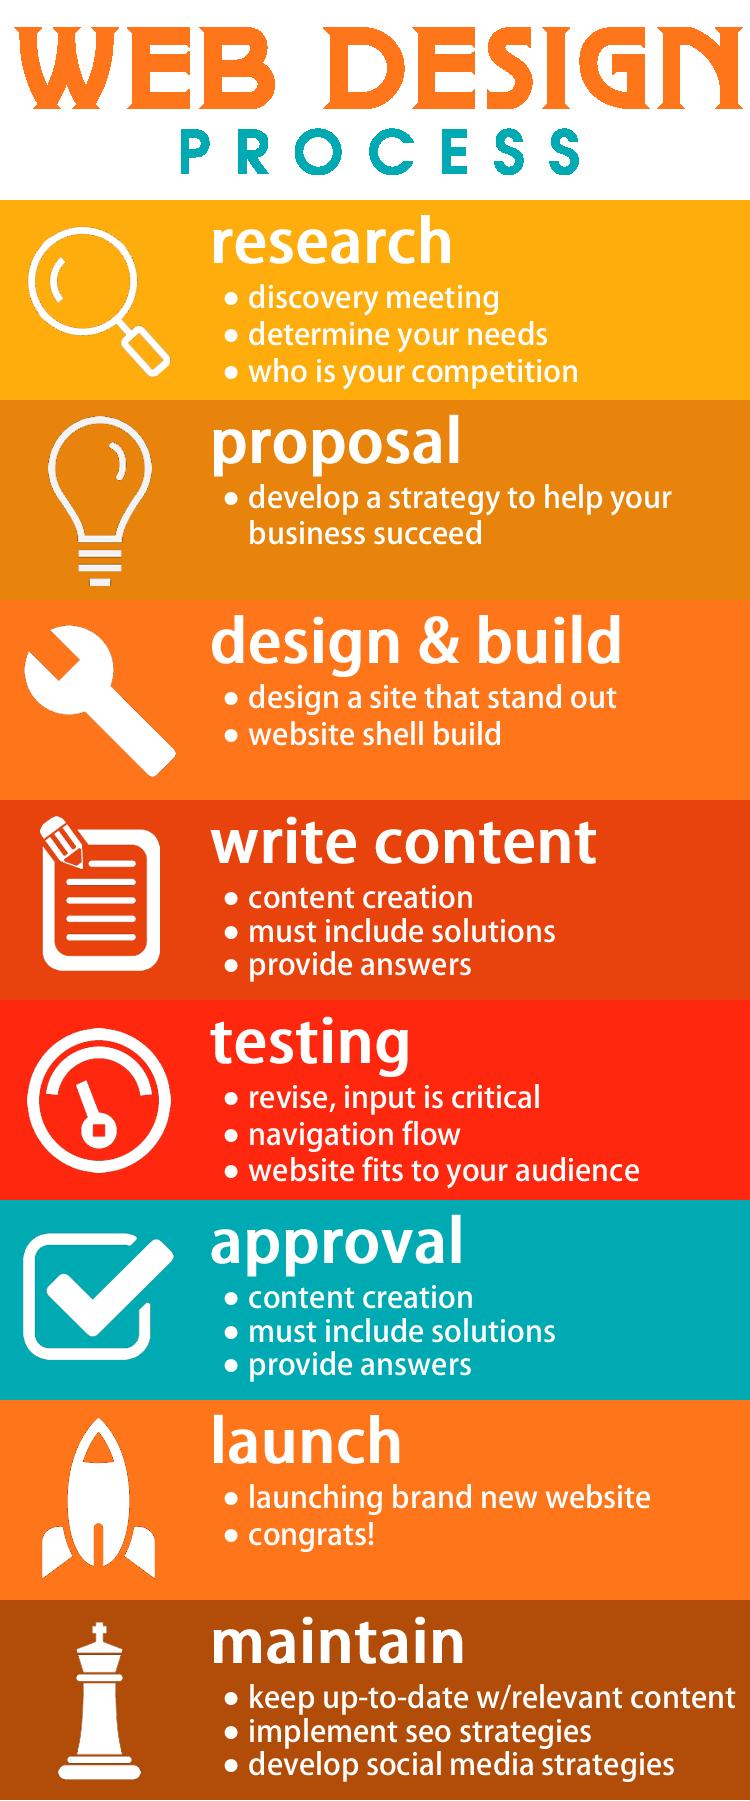 Web Development Process | IT Consultant & Tech Support